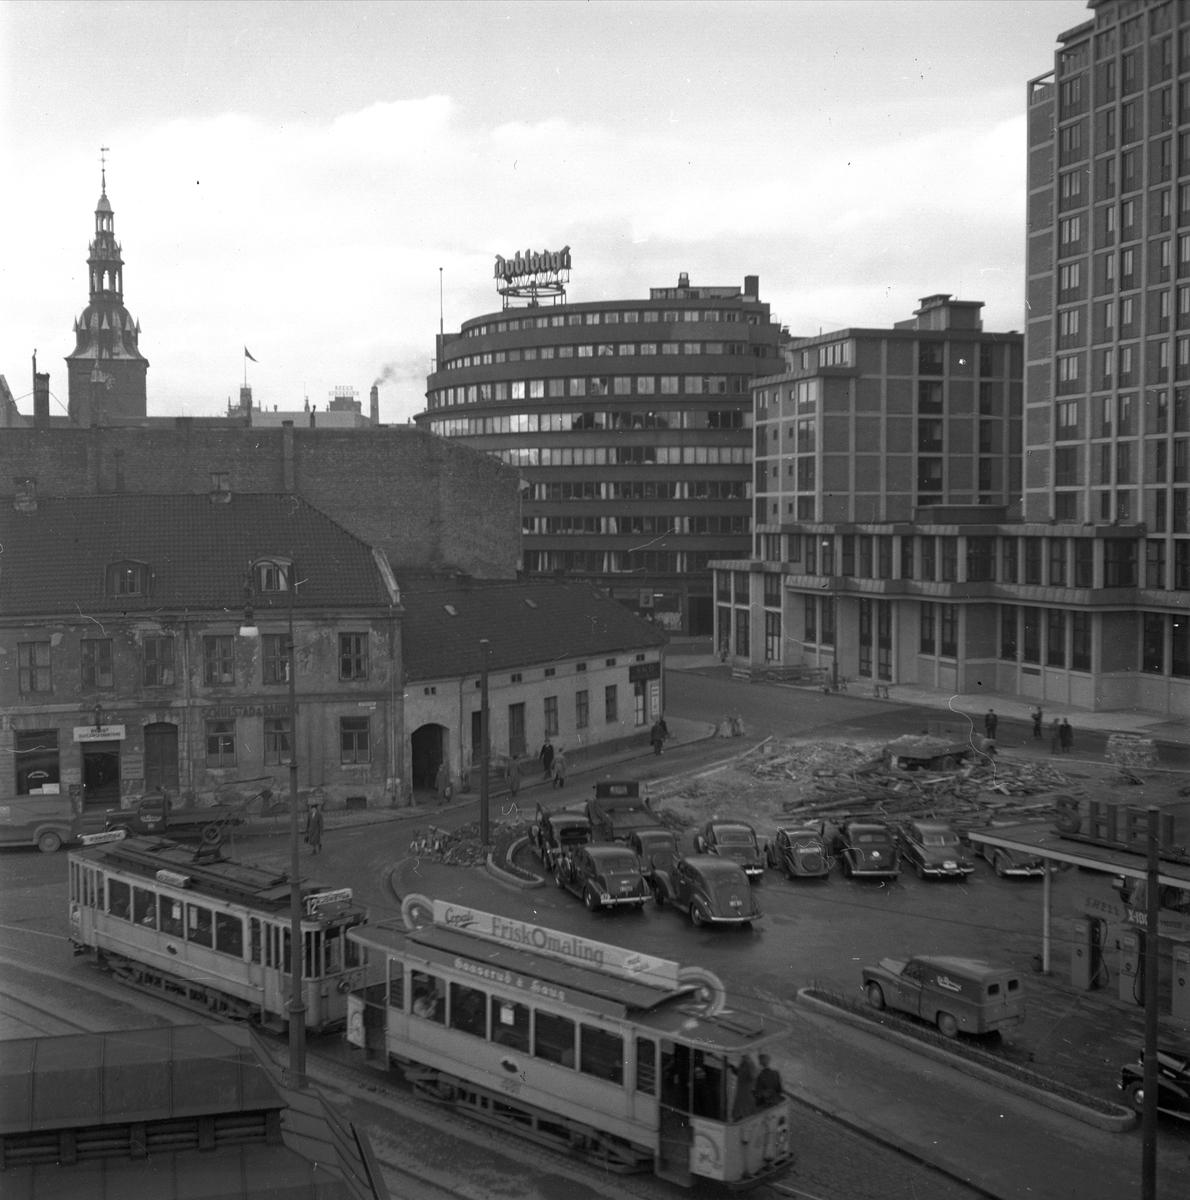 Biskop Gunnerus gate 3, Oslo, 28.11.1951. Hotell Viking. Gatebilde.